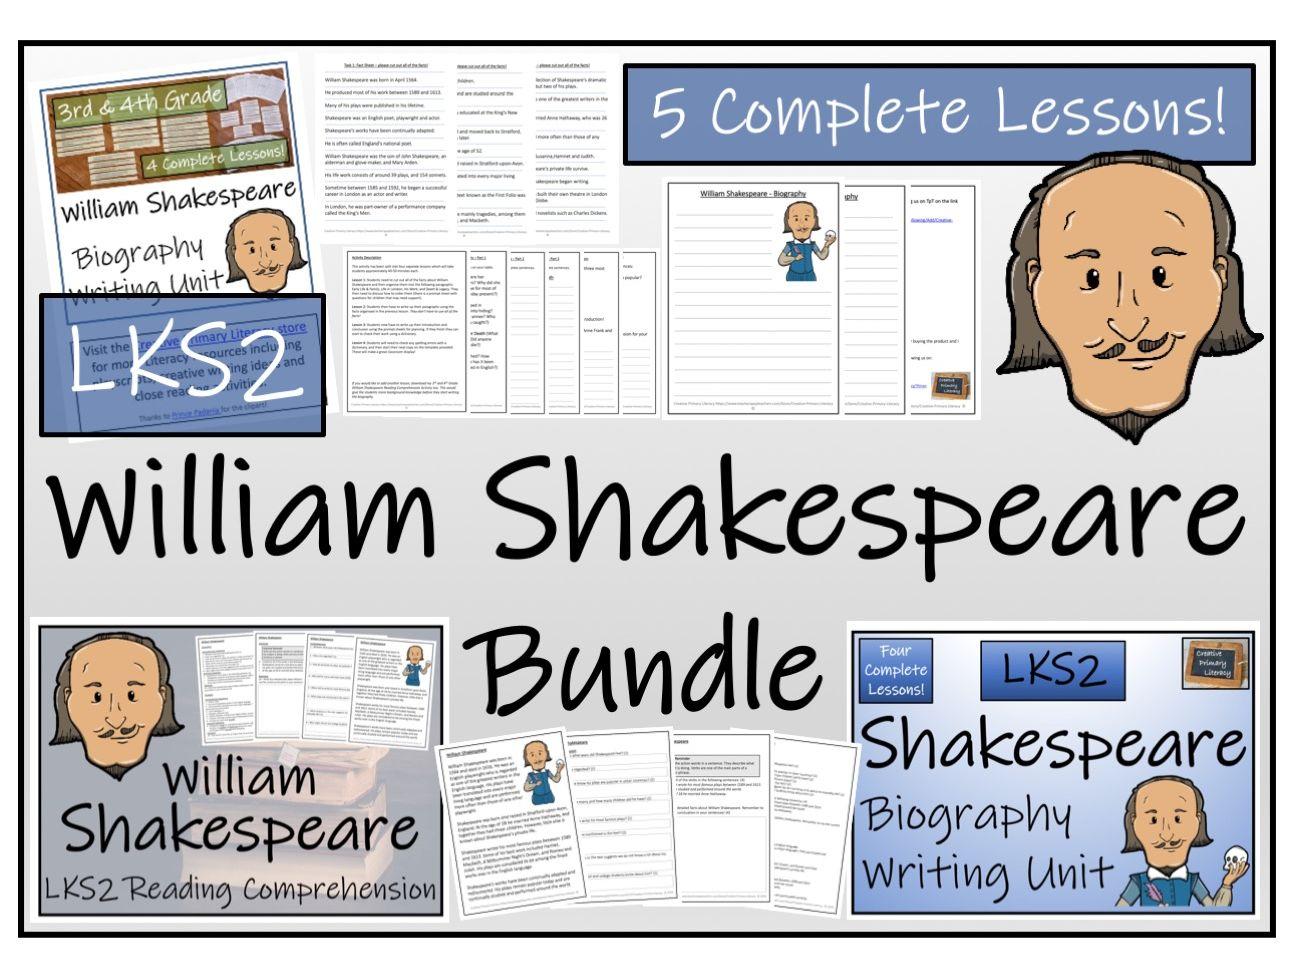 LKS2 Literacy - William Shakespeare Reading Comprehension & Biography Bundle